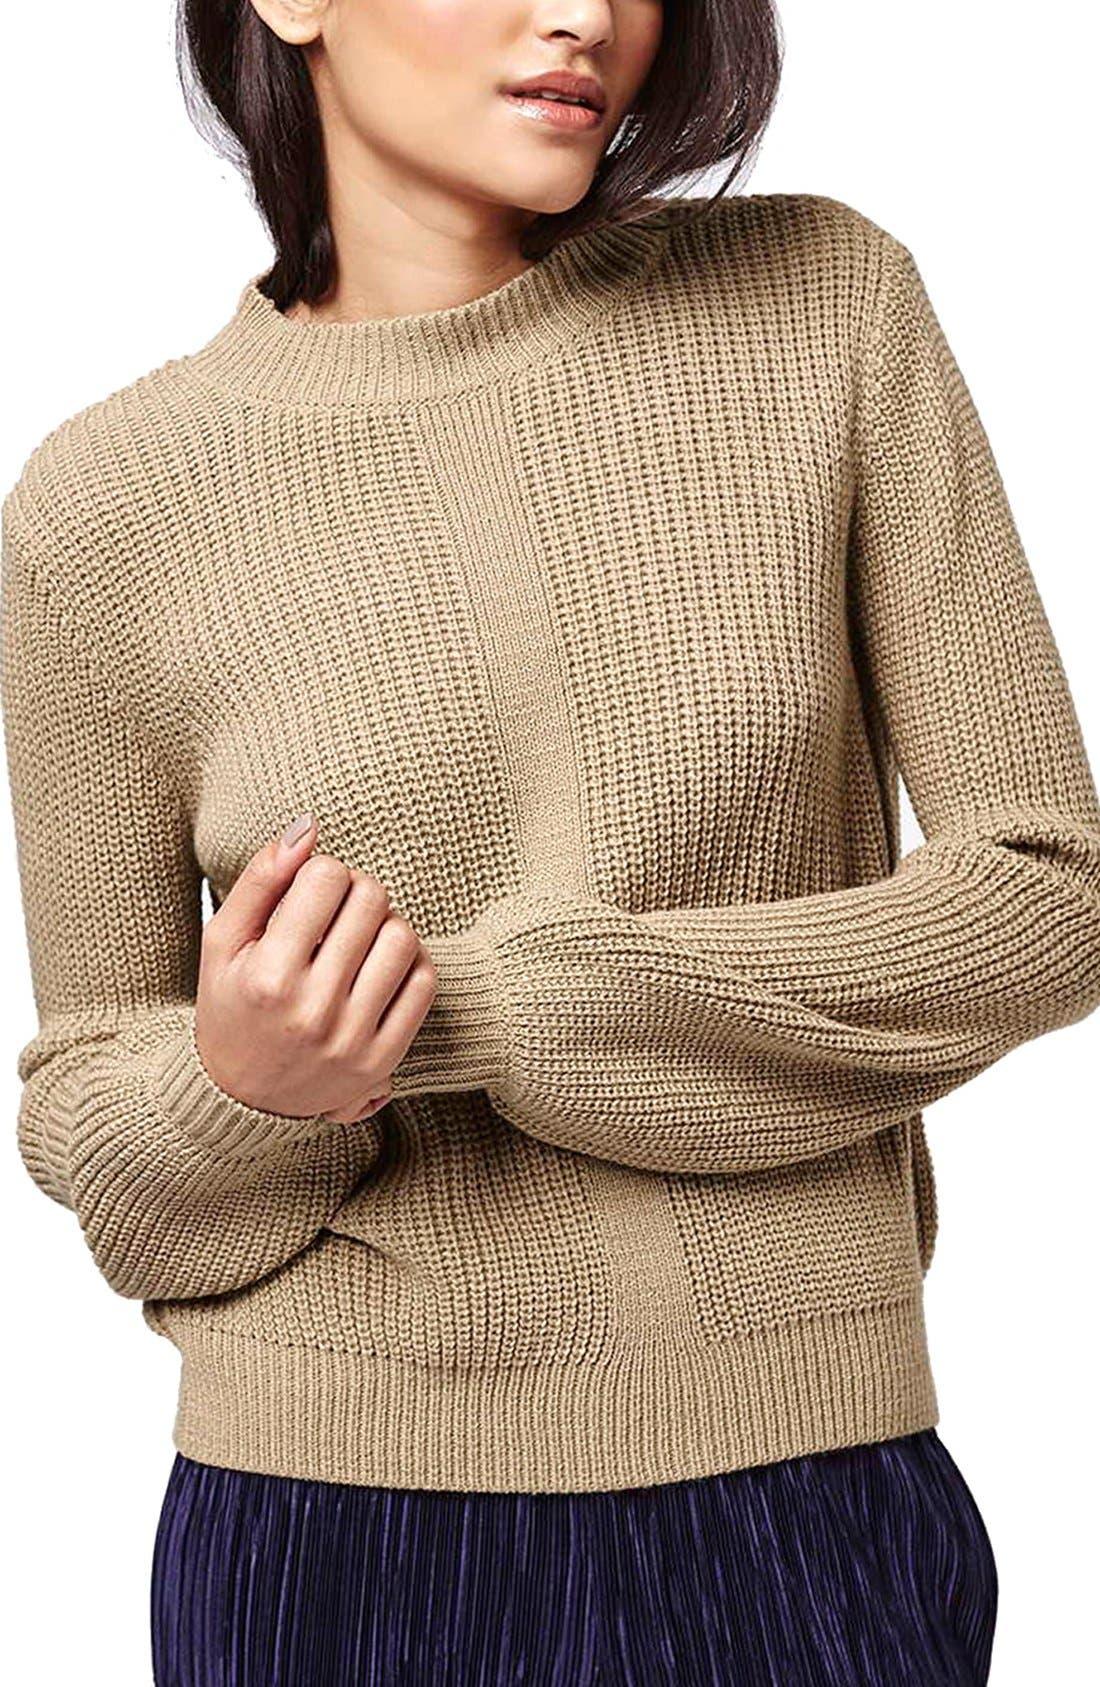 Alternate Image 1 Selected - Topshop Mock Neck Pullover Sweater